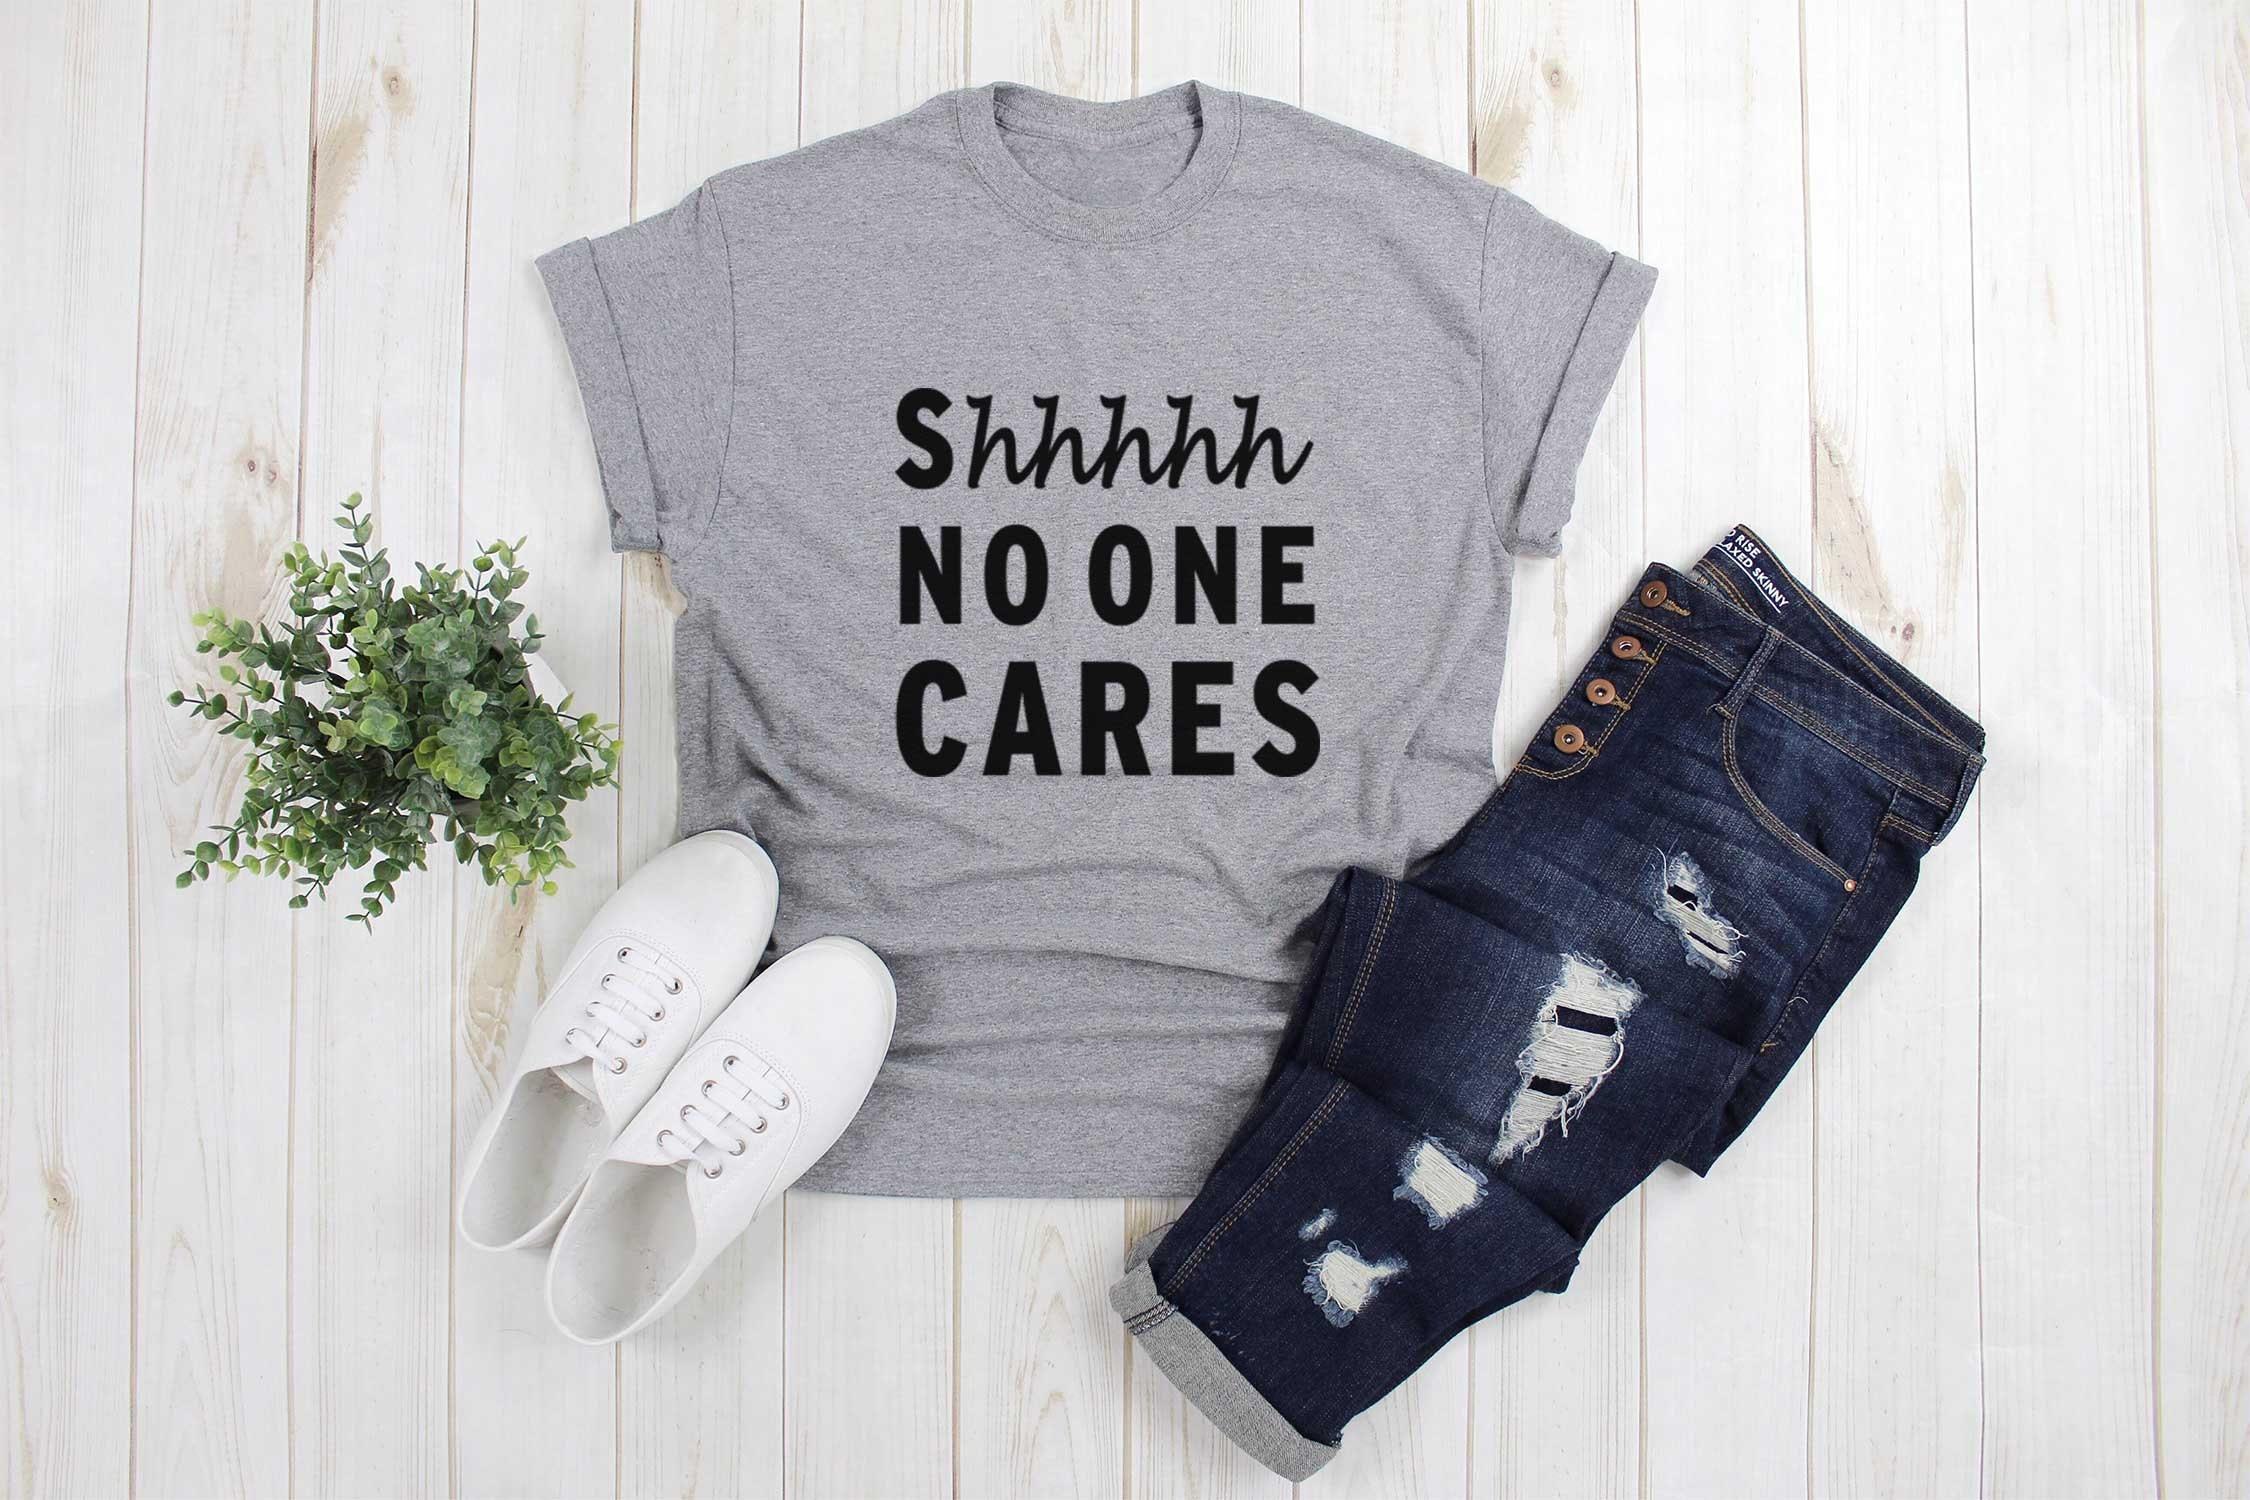 Shhh No one cares T Shirt Design Funny TShirts with sayings Men Women Girl  Teen Tumblr Graphic Tee Slogan Fangirls Pinterest Youtube Shirt